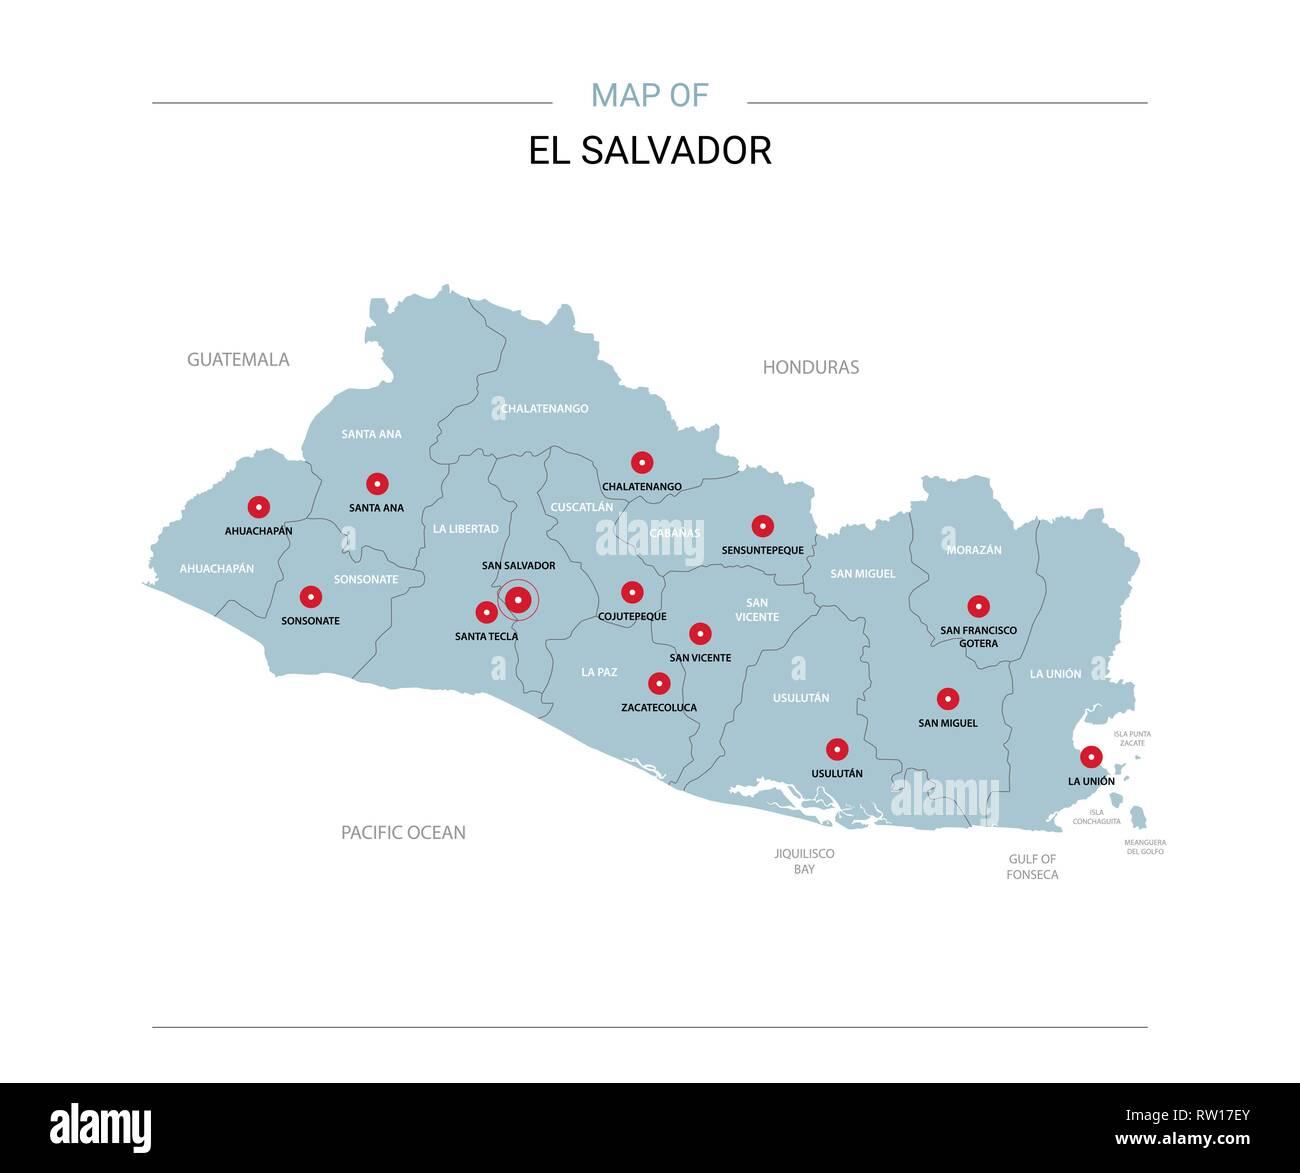 El Salvador vector map. Editable template with regions ... on map of isla margarita, map of campinas, map of san pedro de atacama, map of bissau, map of guatemala, map of regions of brazil, map of culiacan, map of south of the border, map of san pedro de macoris, map of asunción, map of ciudad del este, map of pereira, map of san pedro la laguna, map of central america, map of ilhabela, map of antarctic sound, map of sunset boulevard, map of la serena, map of honduras, map of san cristobal de las casas,